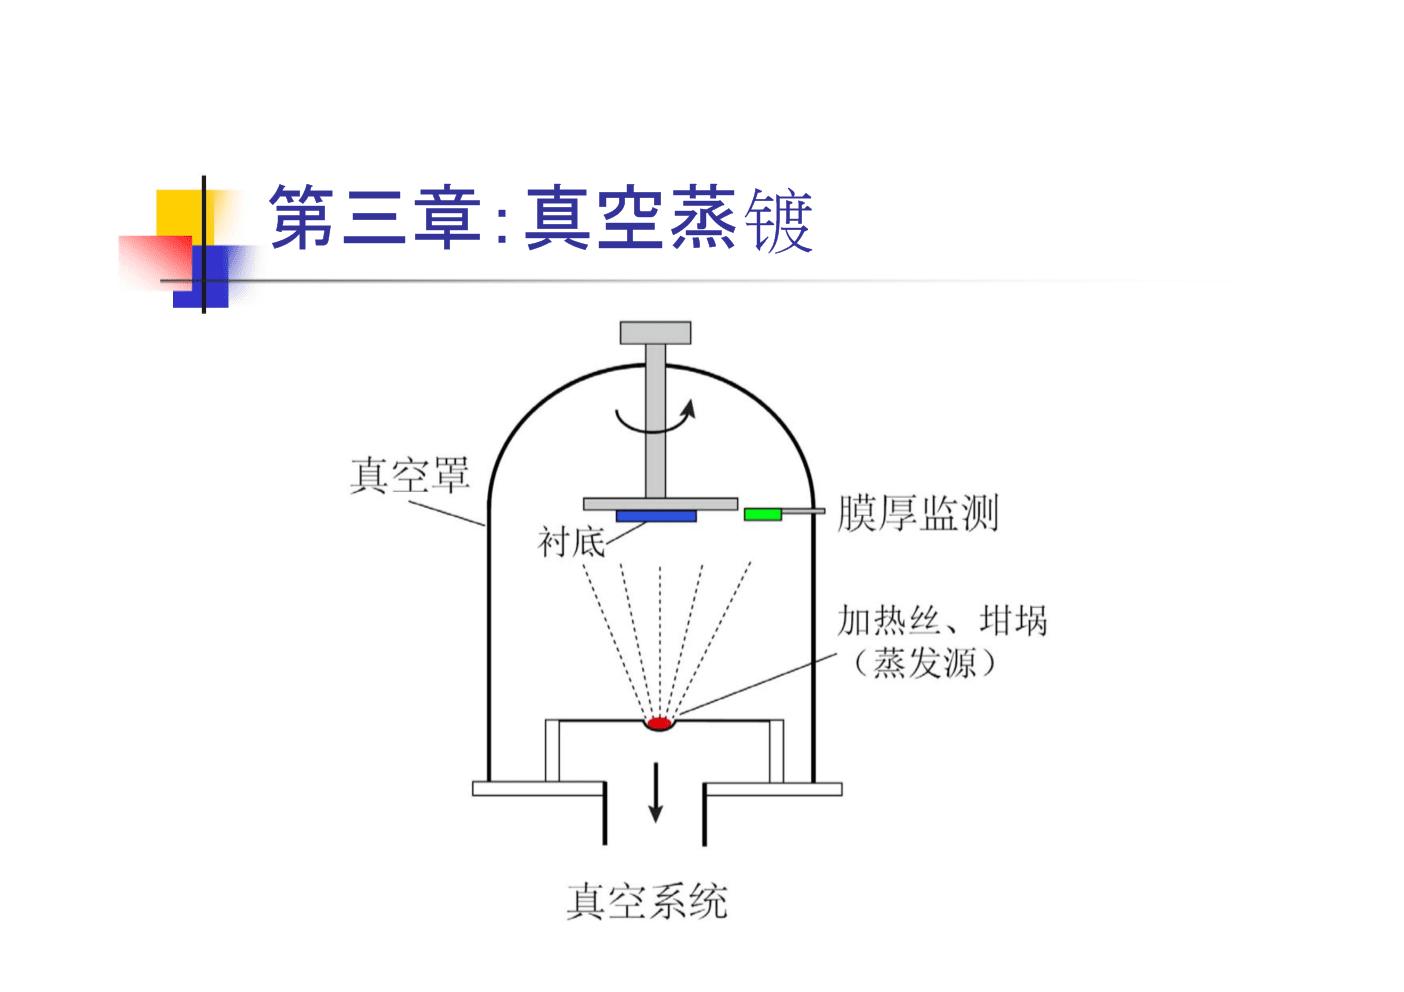 pet膜阻燃报告_耐高温阻燃纤维制成的阻燃面料_阻燃镀铝膜